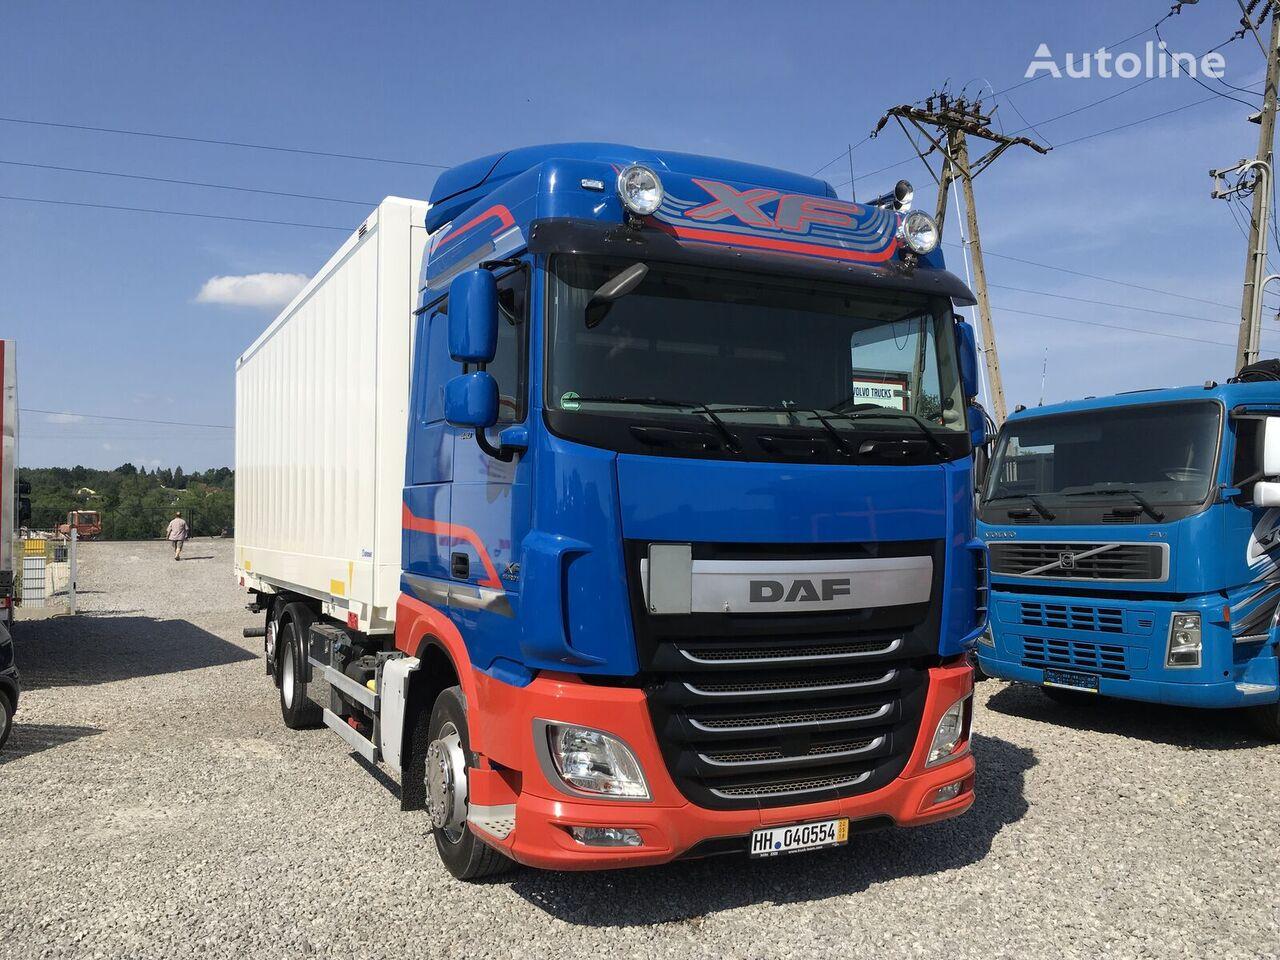 ciężarówka izoterma DAF XF 106.440 E6 105 kontener 6x2 , Super stan